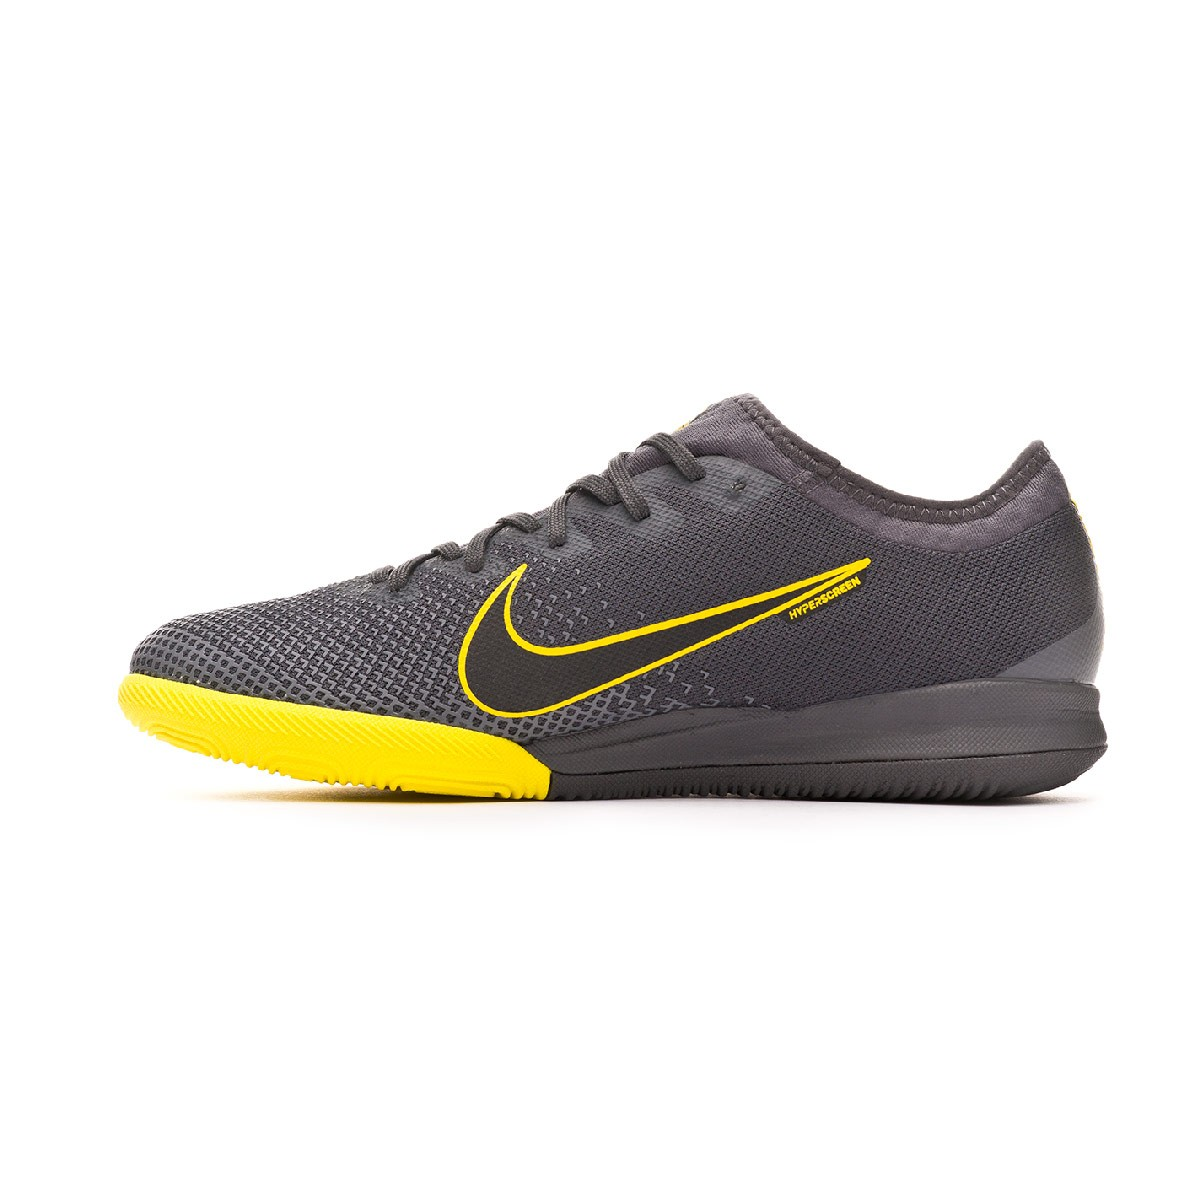 Sapatilha de Futsal Nike Mercurial VaporX XII Pro IC